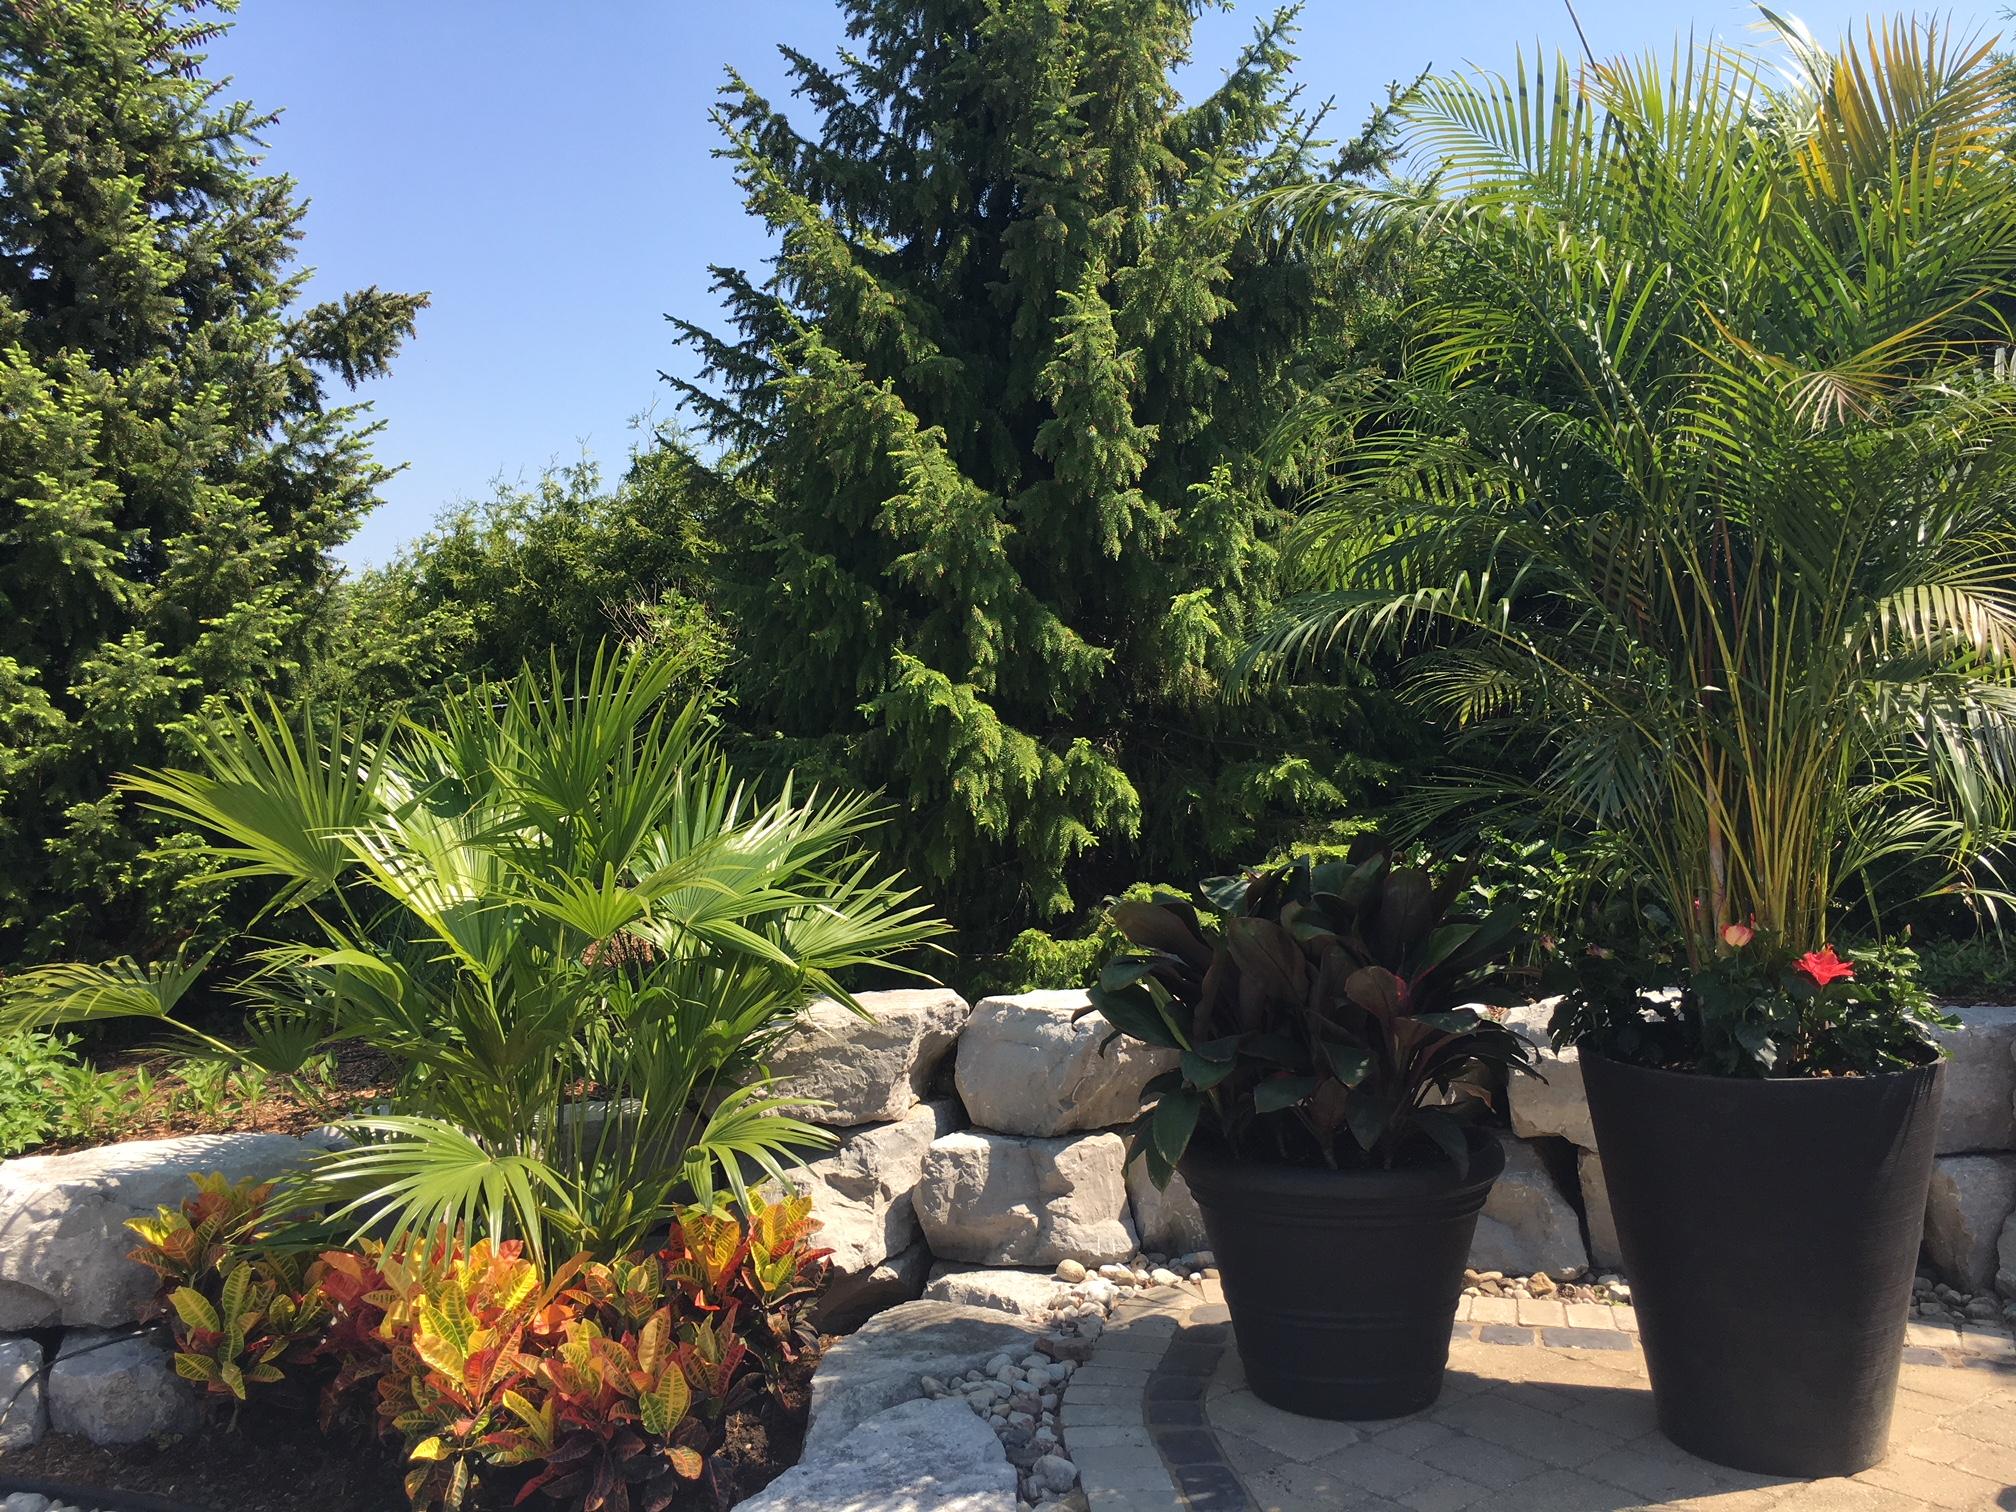 PALM TREES 2018